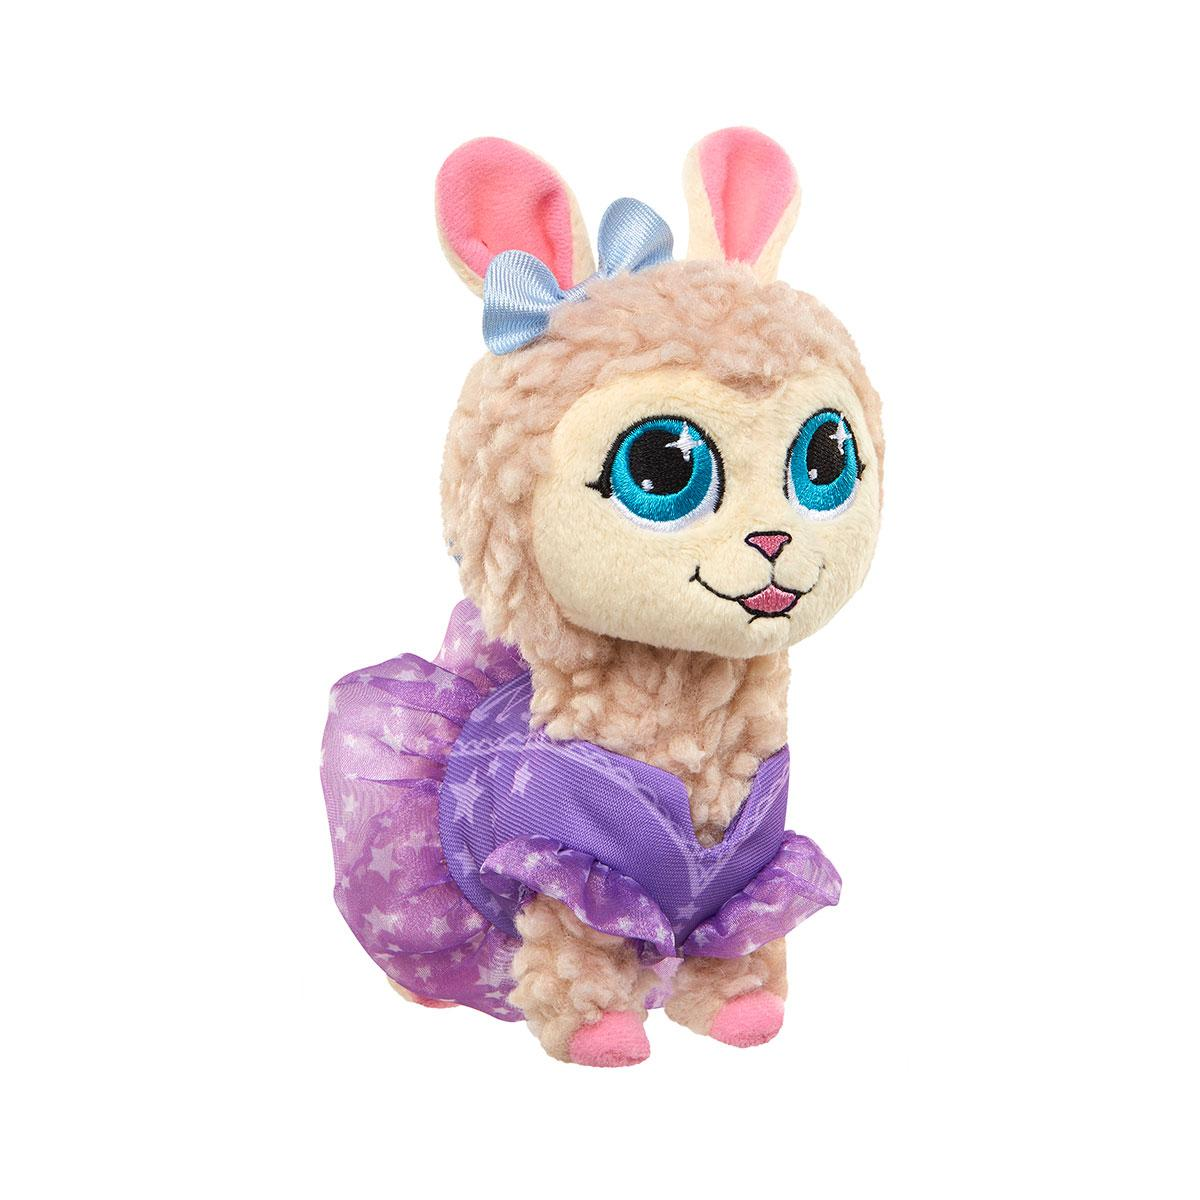 М'яка Іграшка Who's Your Llama? S1 - Фея-Лама